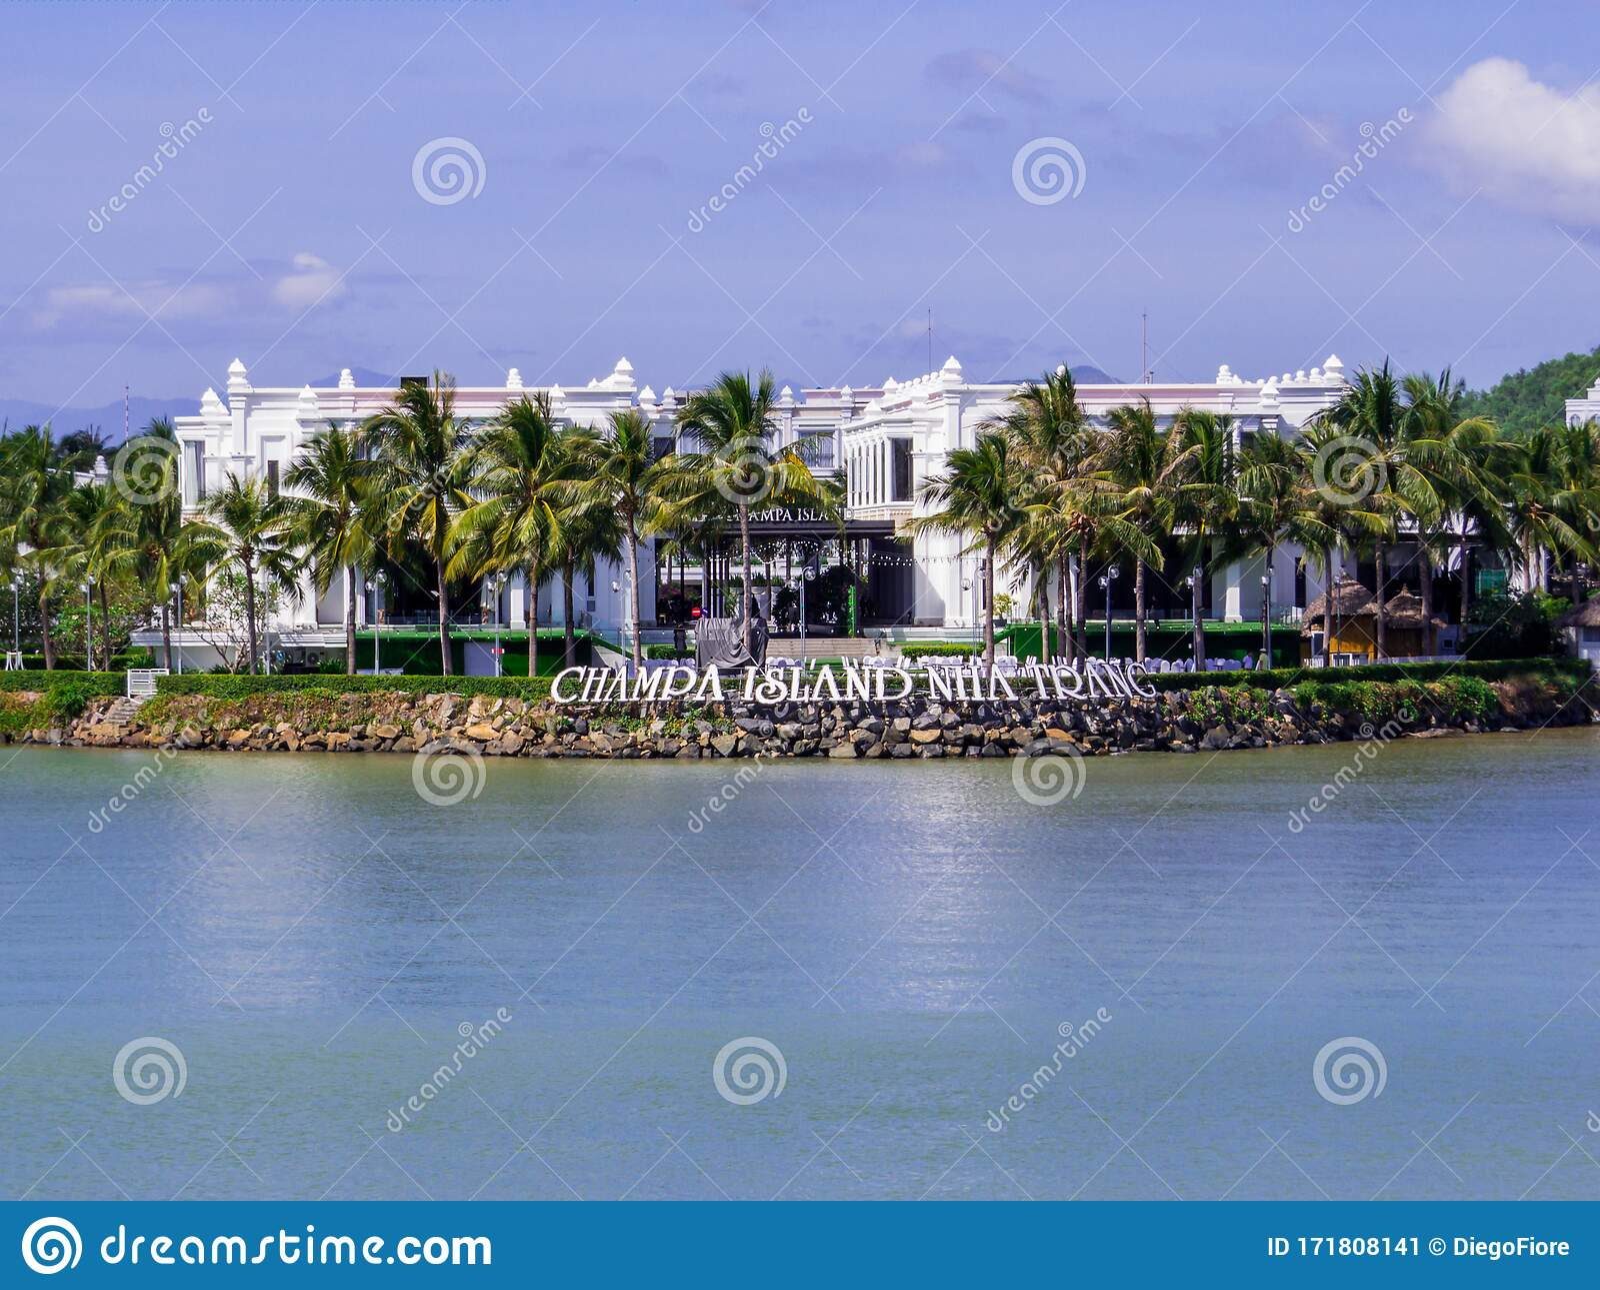 Champa Island Nha Trang Vietnam Editorial Photo Image Of December River 171808141